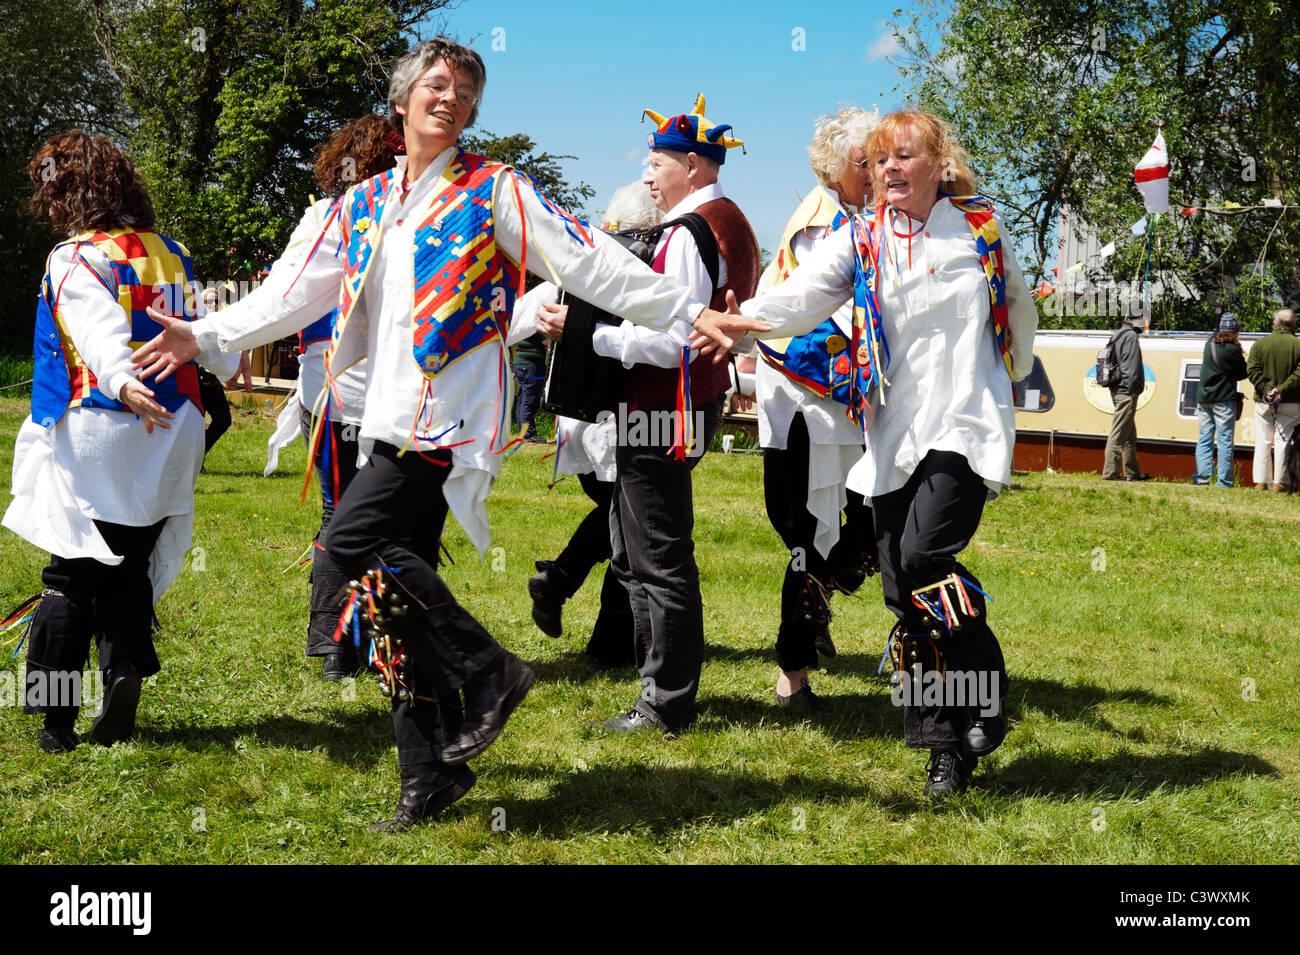 Women morris dancing, Aylestone Park, Hereford, UK. Female morris dancers giving a public performance. - Stock Image